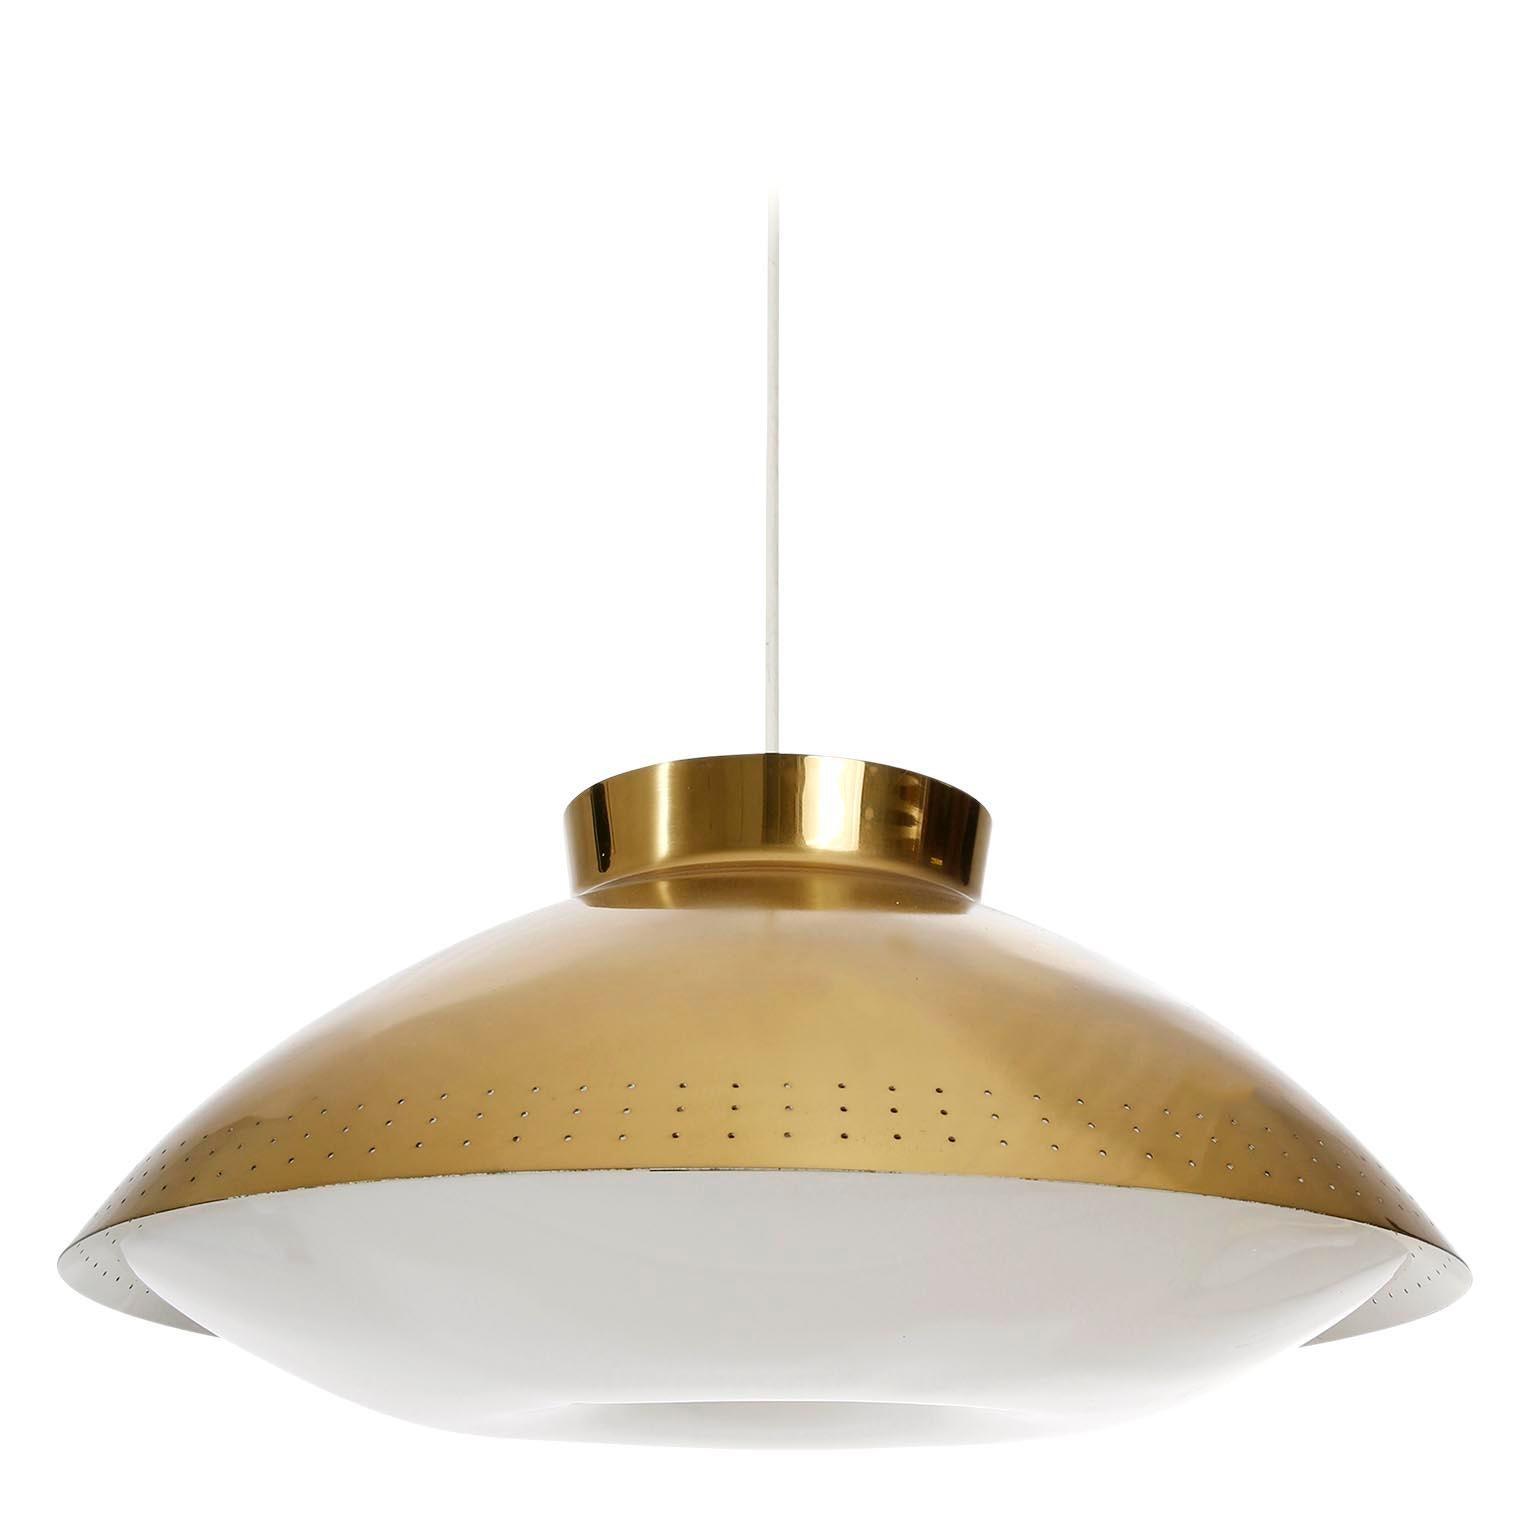 Lisa Johansson-Pape Pendant Light, Orno, Opal Plexiglass Brass, Finland, 1950s